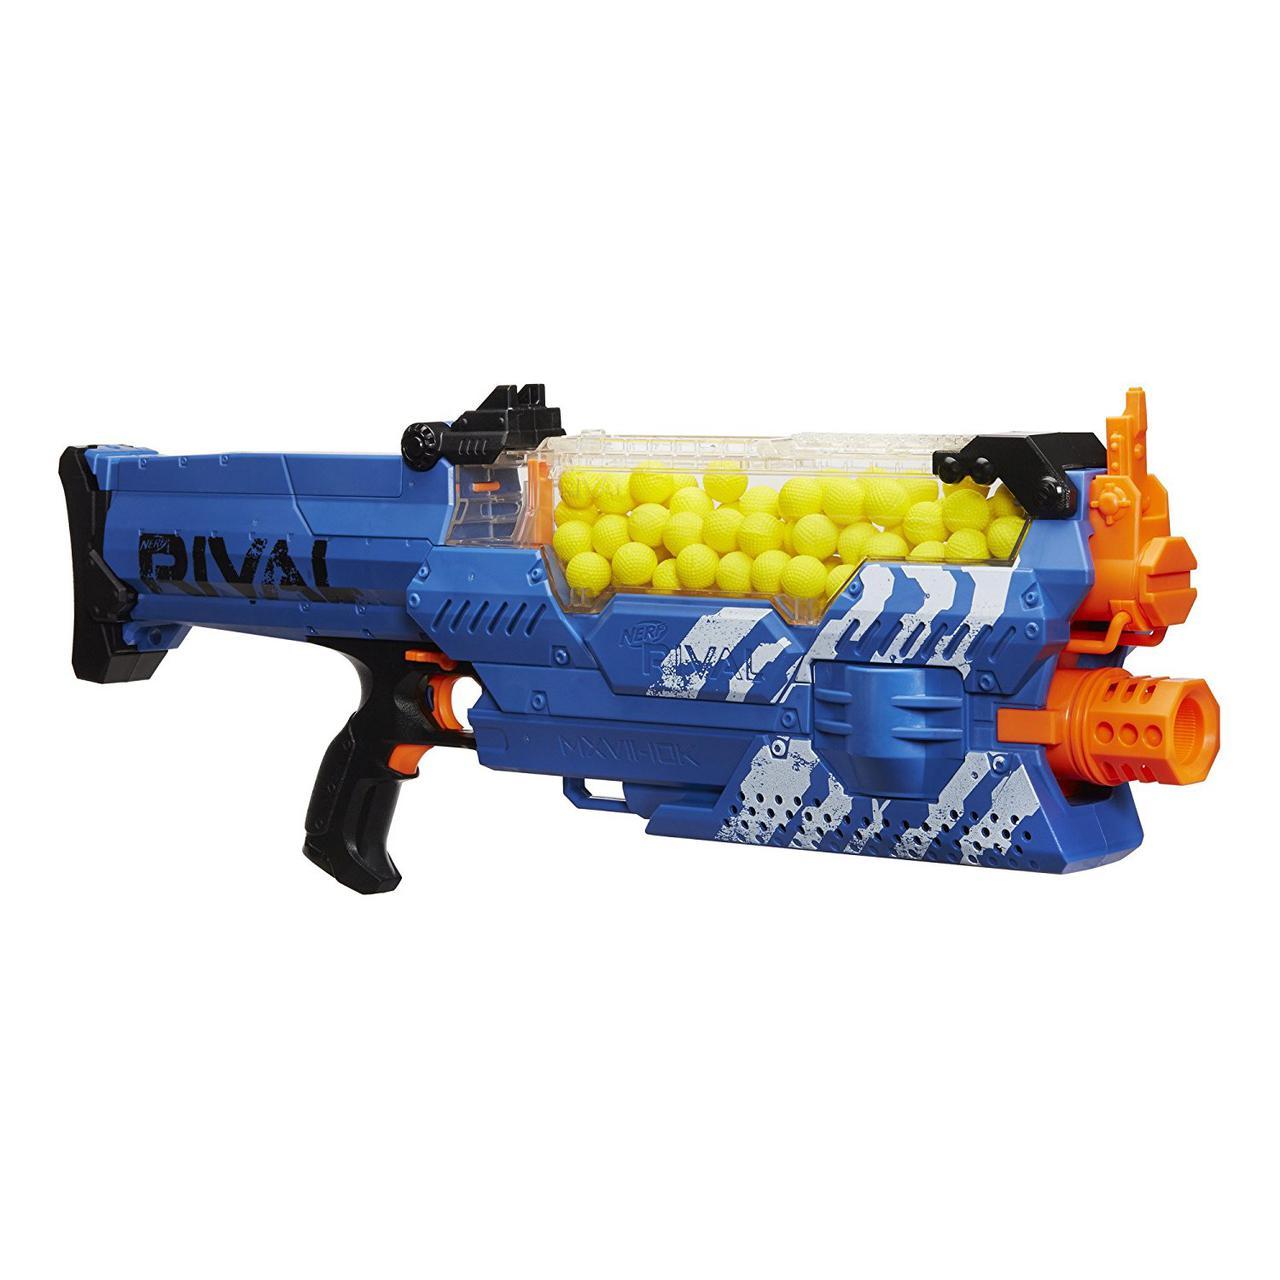 Nerf Rival Бластер Нерф Райвал Немезис Nemesis MXVII-10K синий